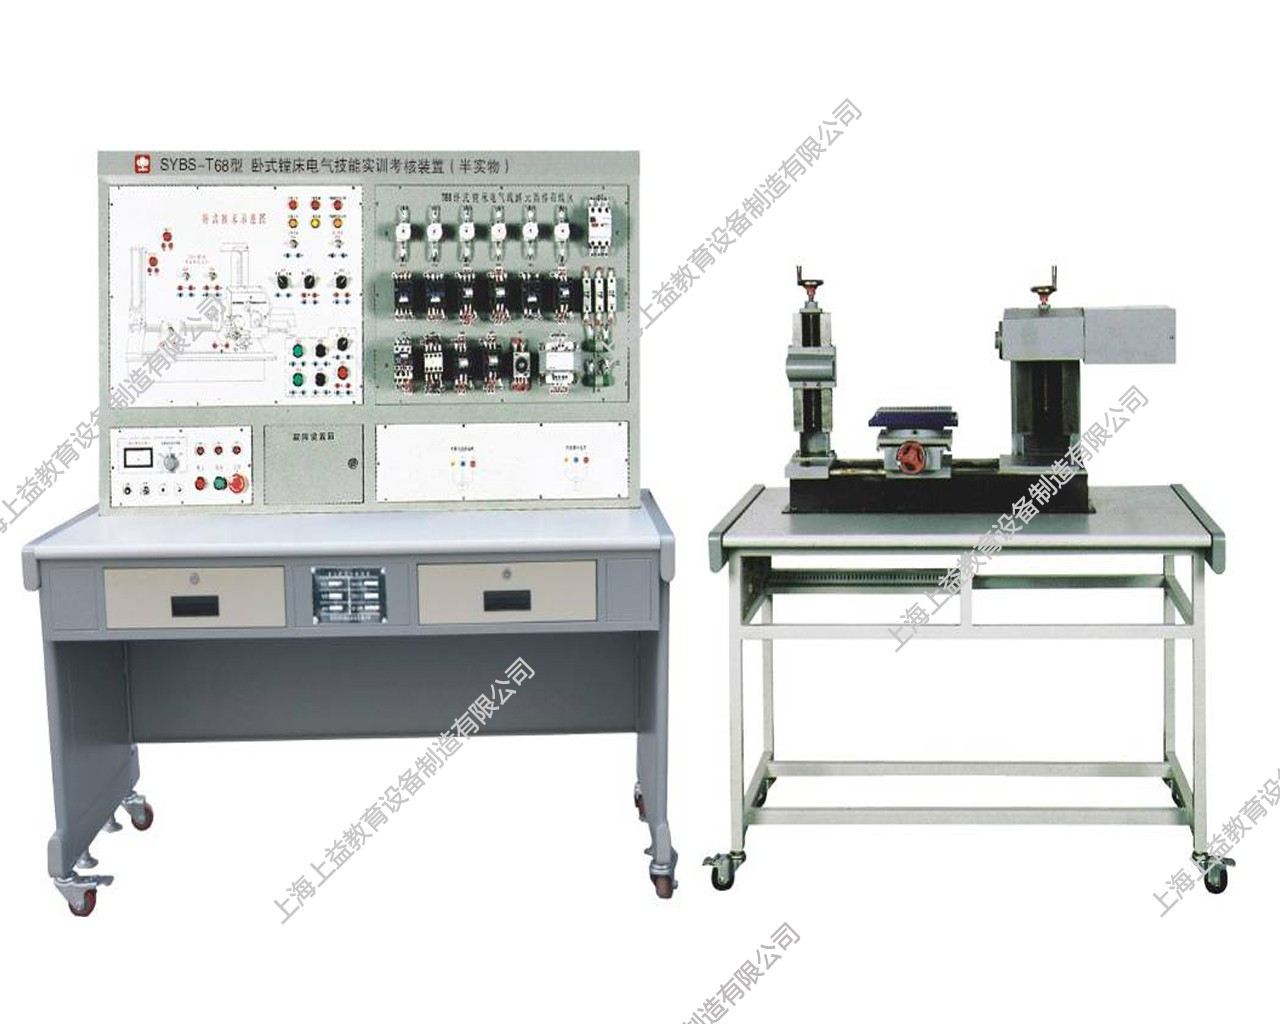 SYBS-T68卧室镗床电气技能wwwlehu8viplehu68vip装置(半实物)